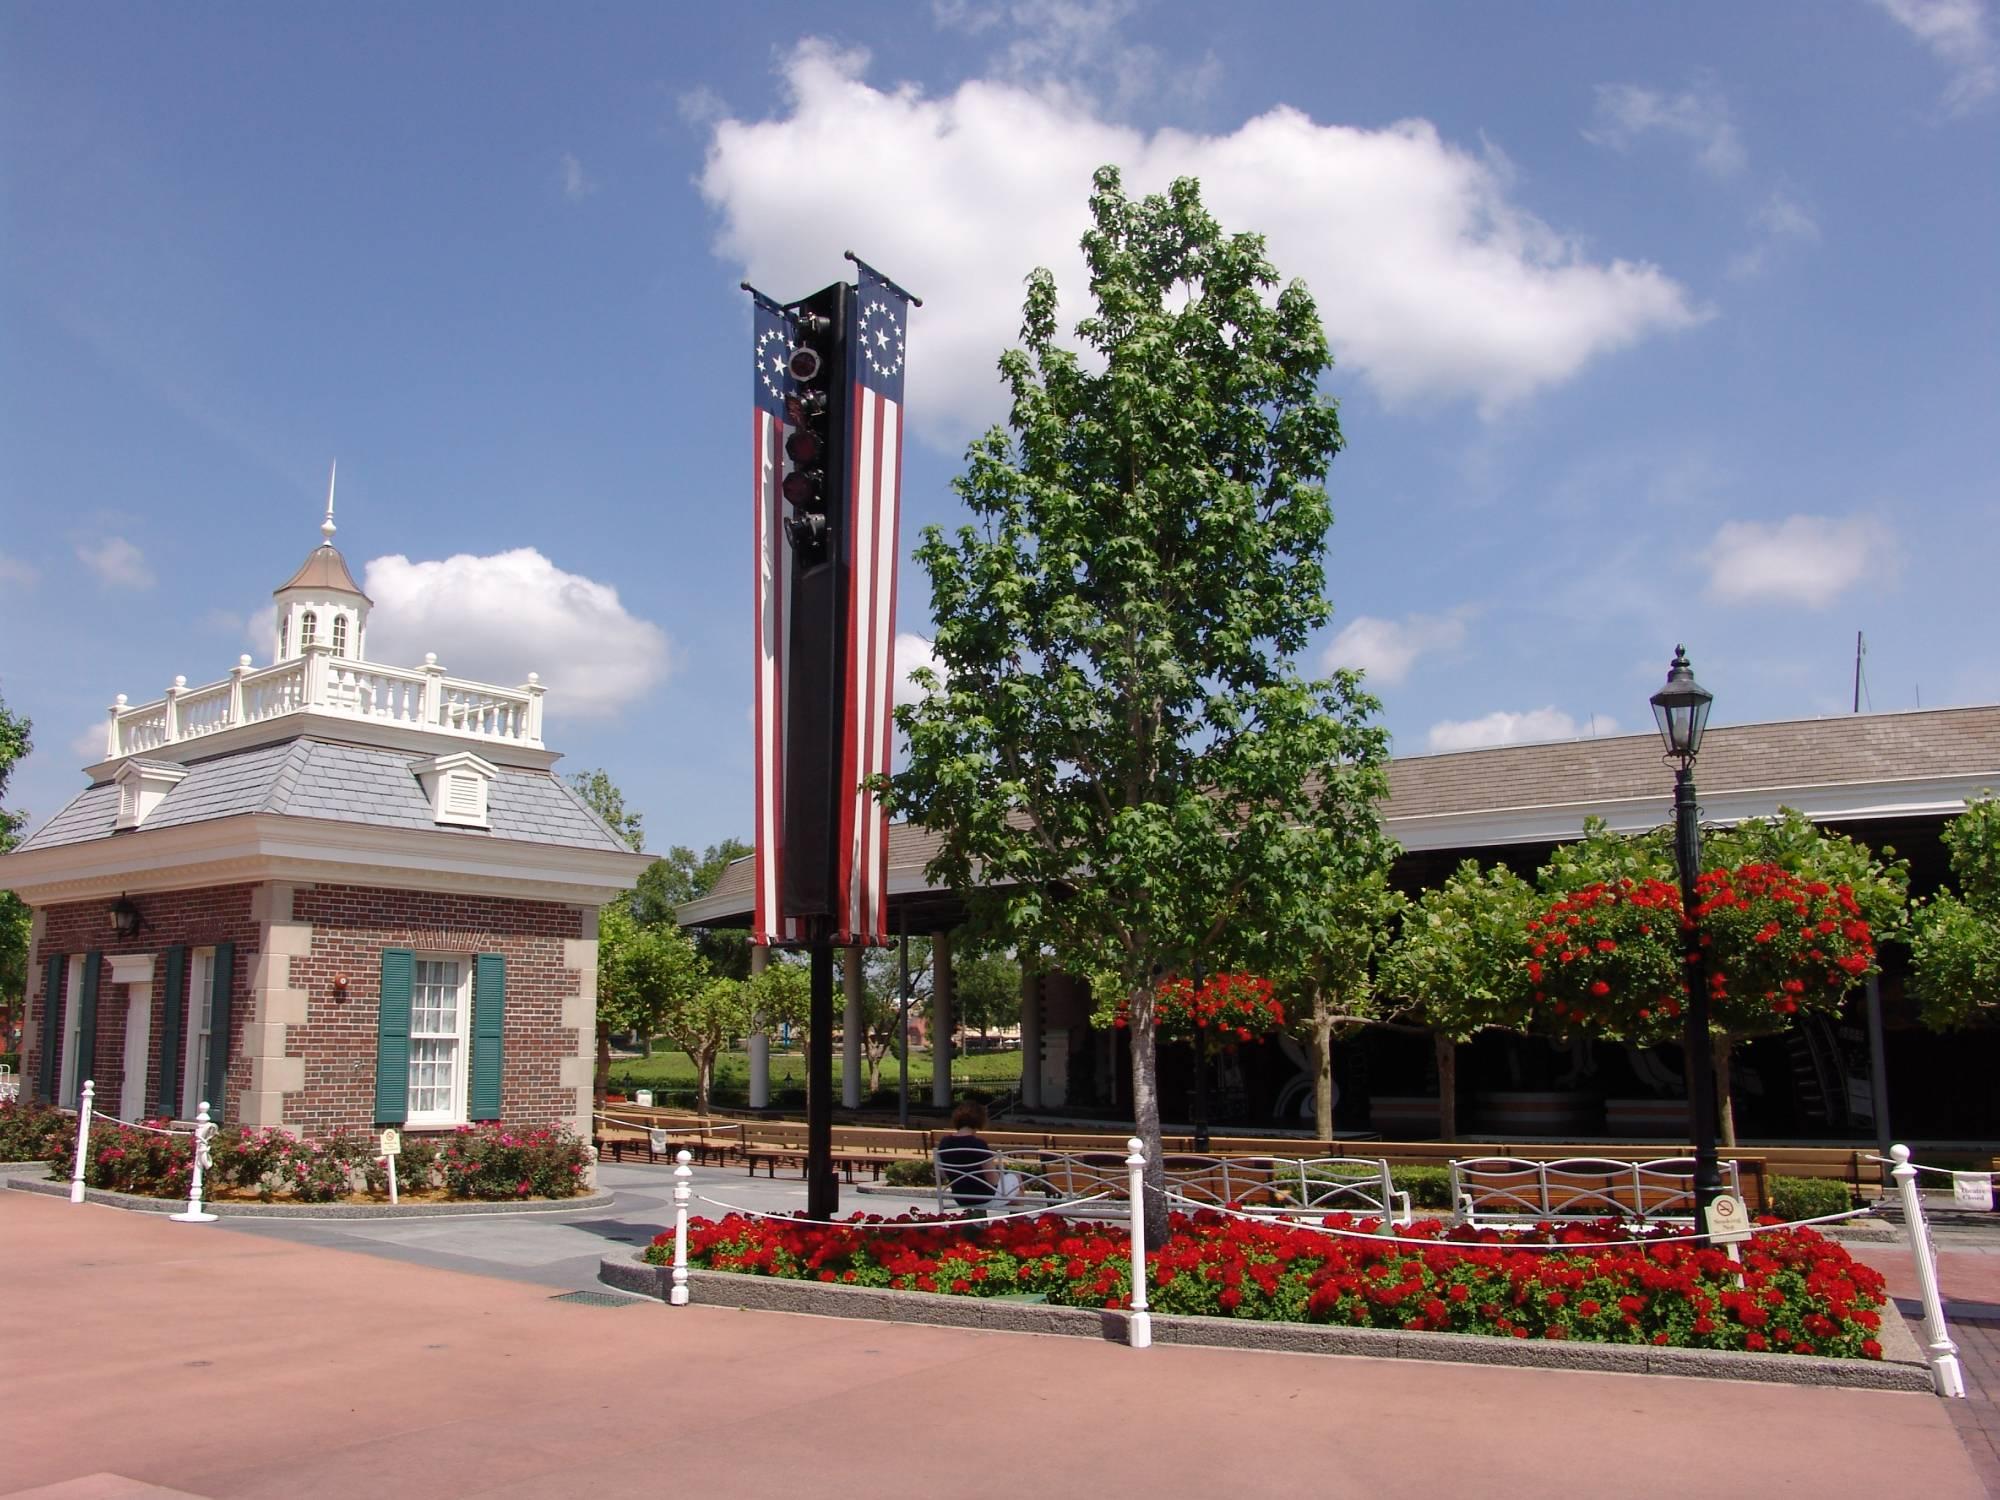 American Gardens Theatre